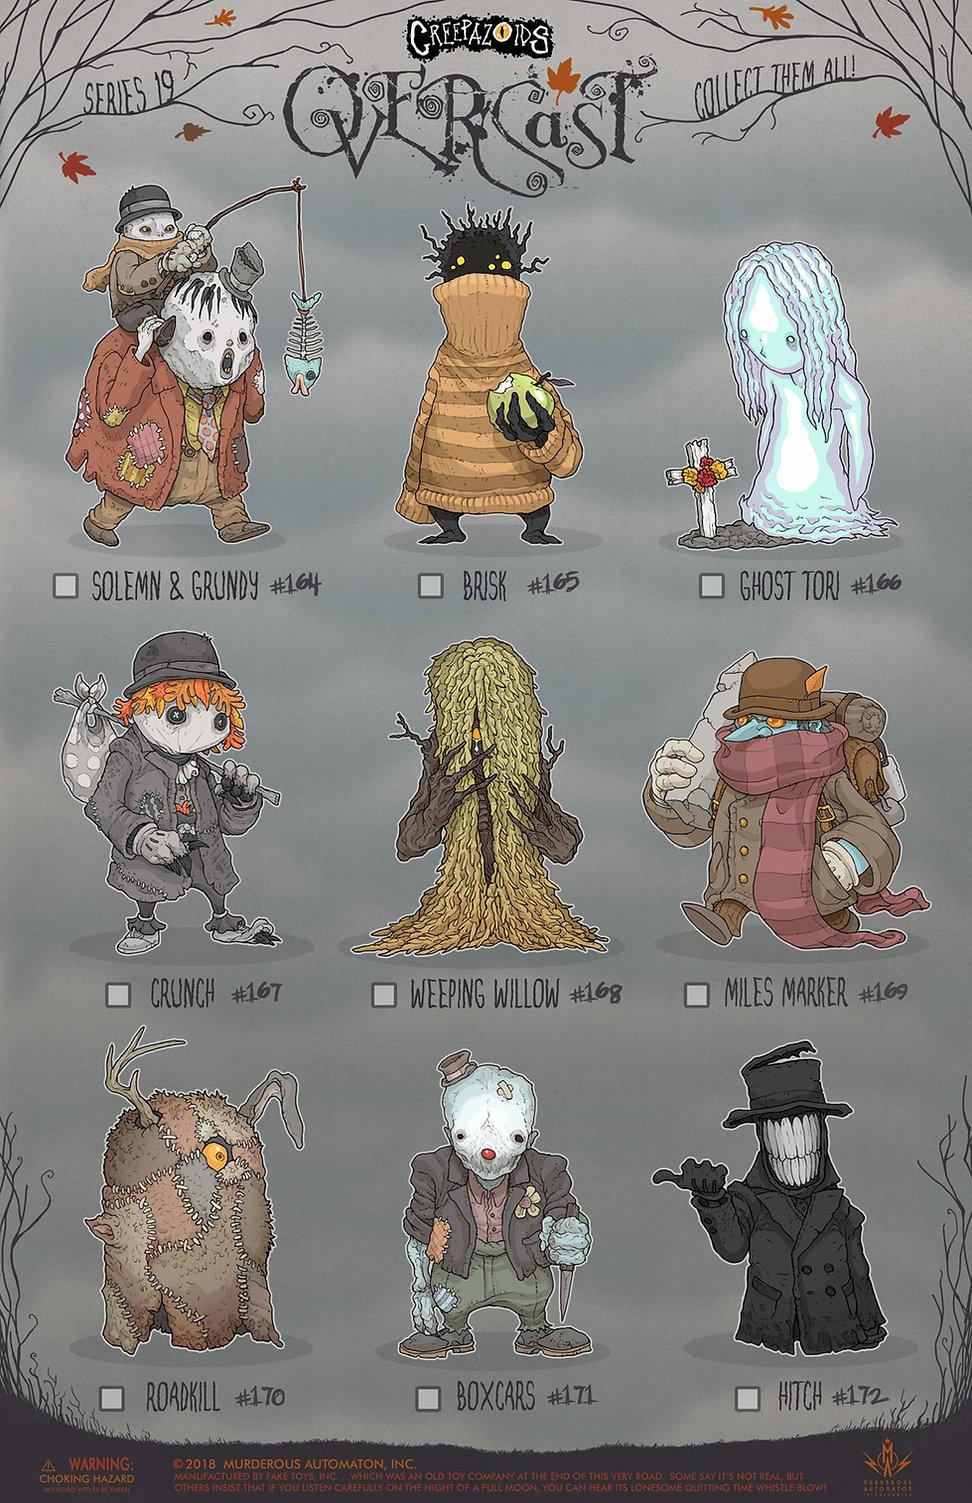 19 Creepazoids Poster--Overcast.jpg